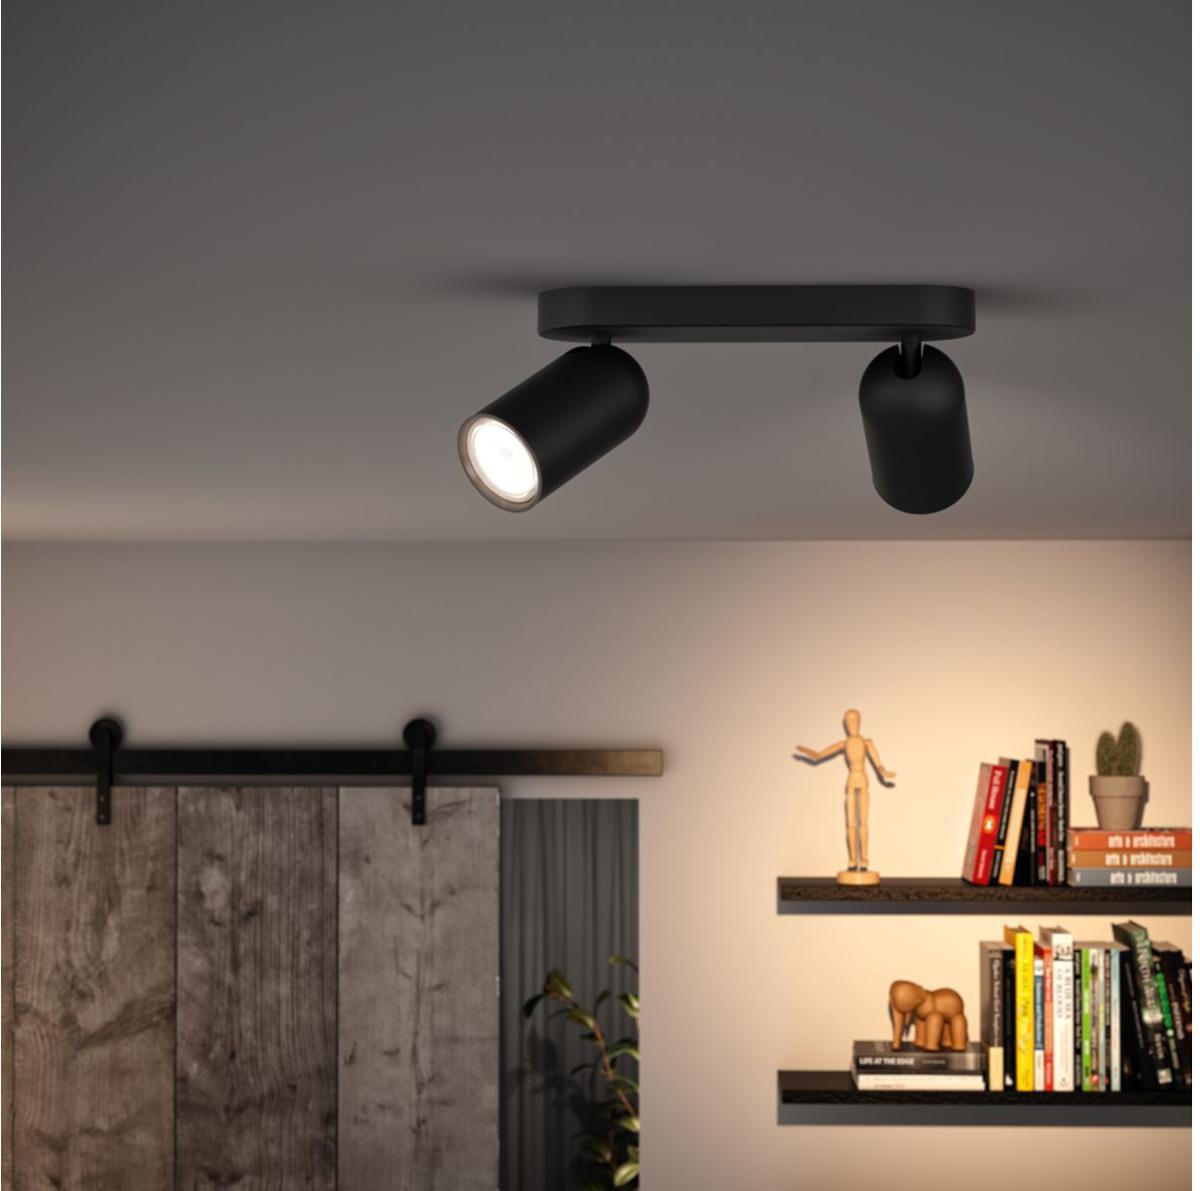 Philips LED Spotlicht GU10 2x10W Tageslicht schwarz Pongee 50582/30/PN